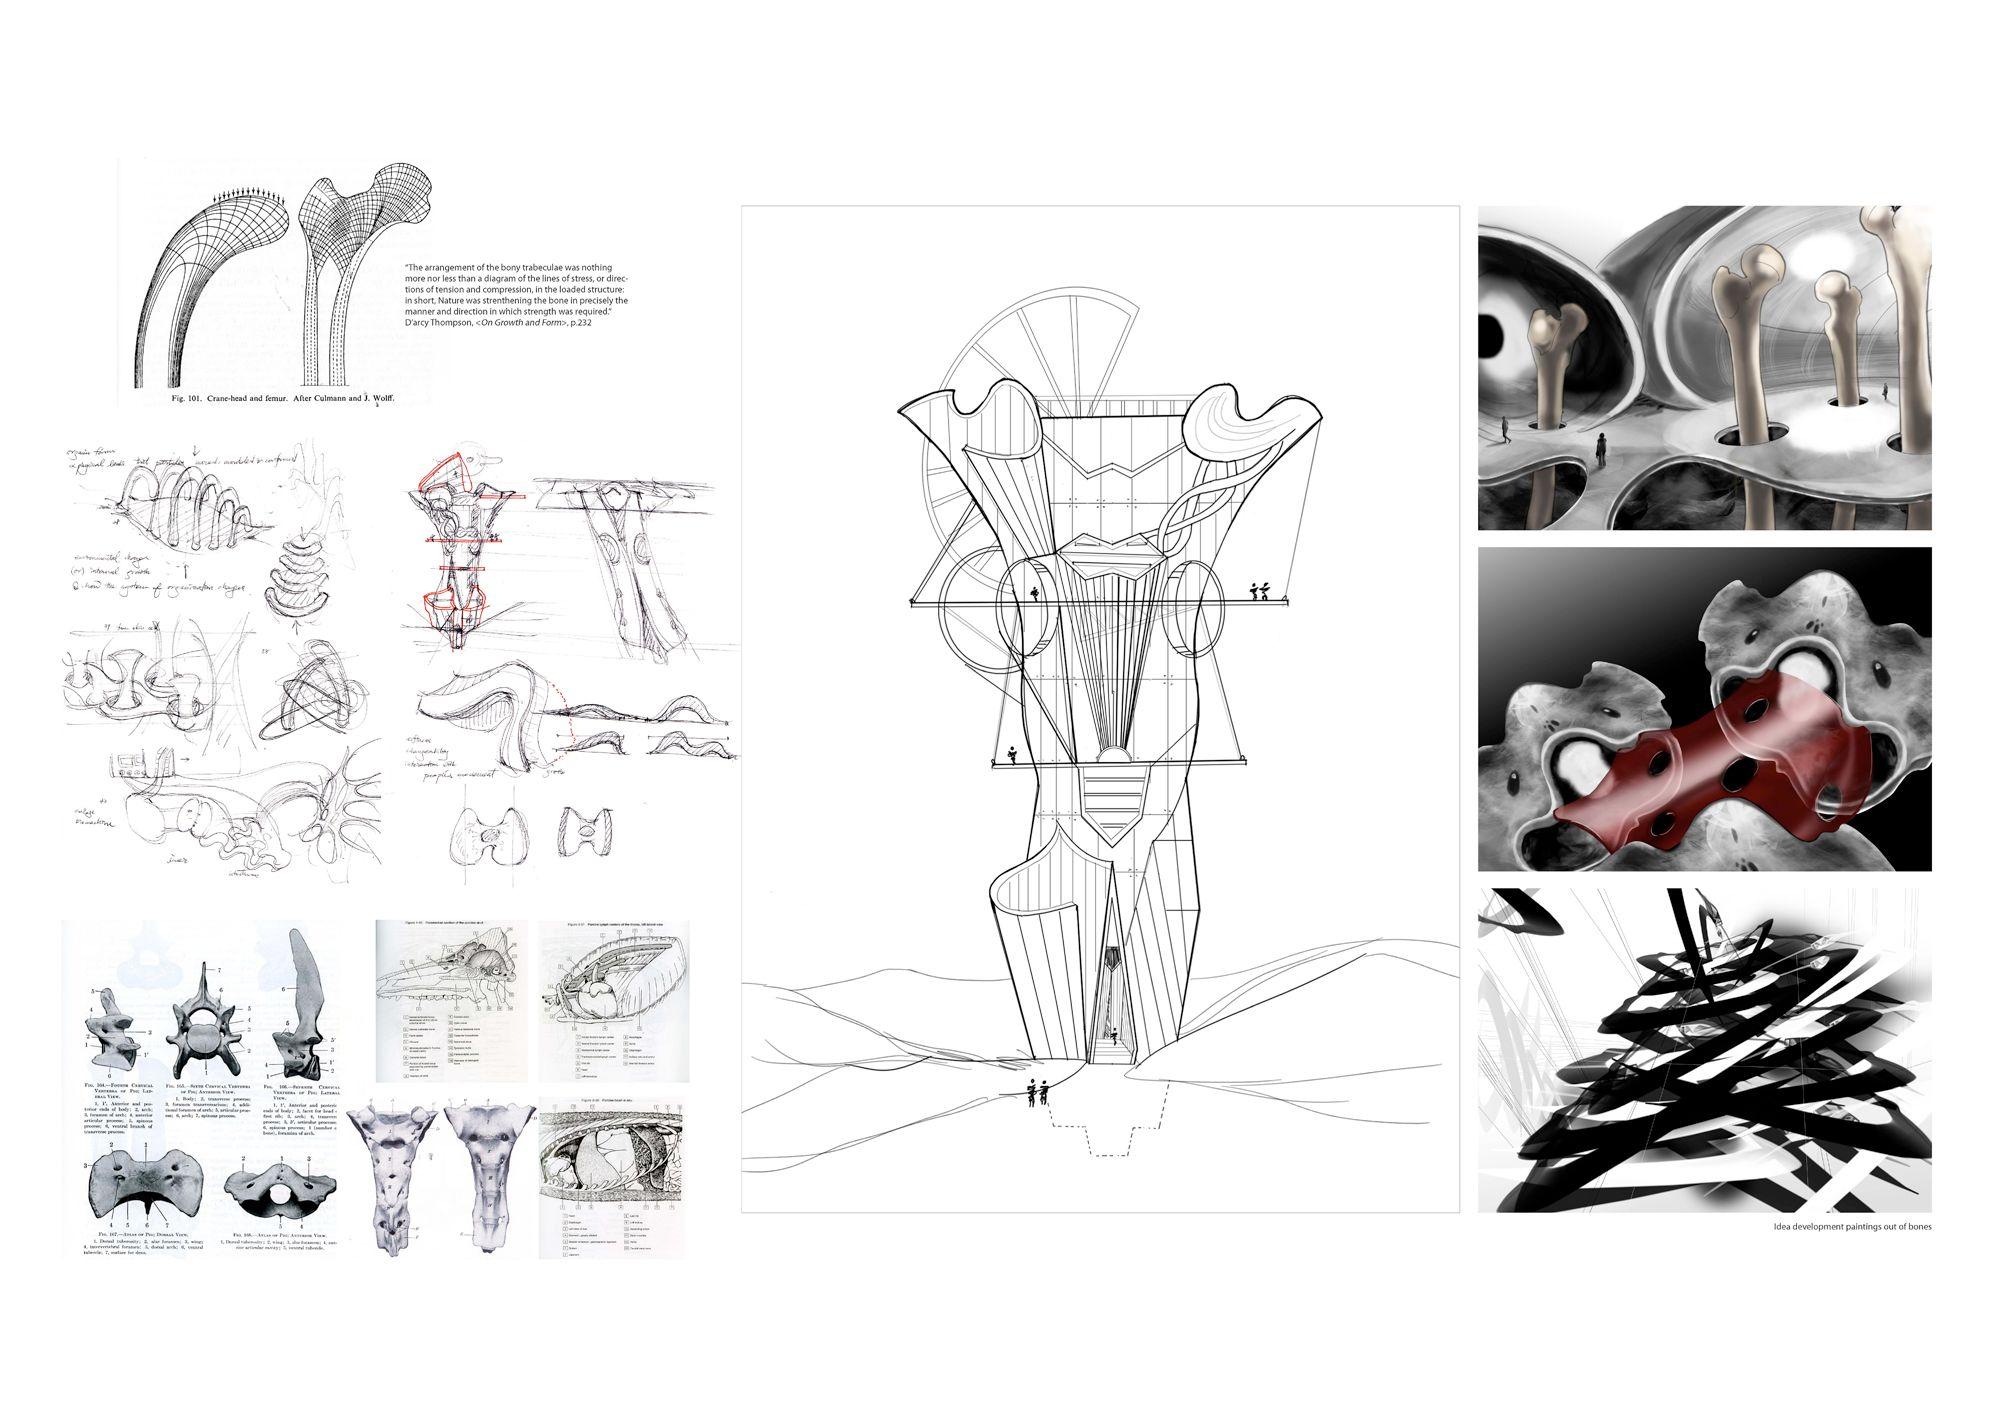 Heonrk 1 Idea Development Drawing Out Of Bones